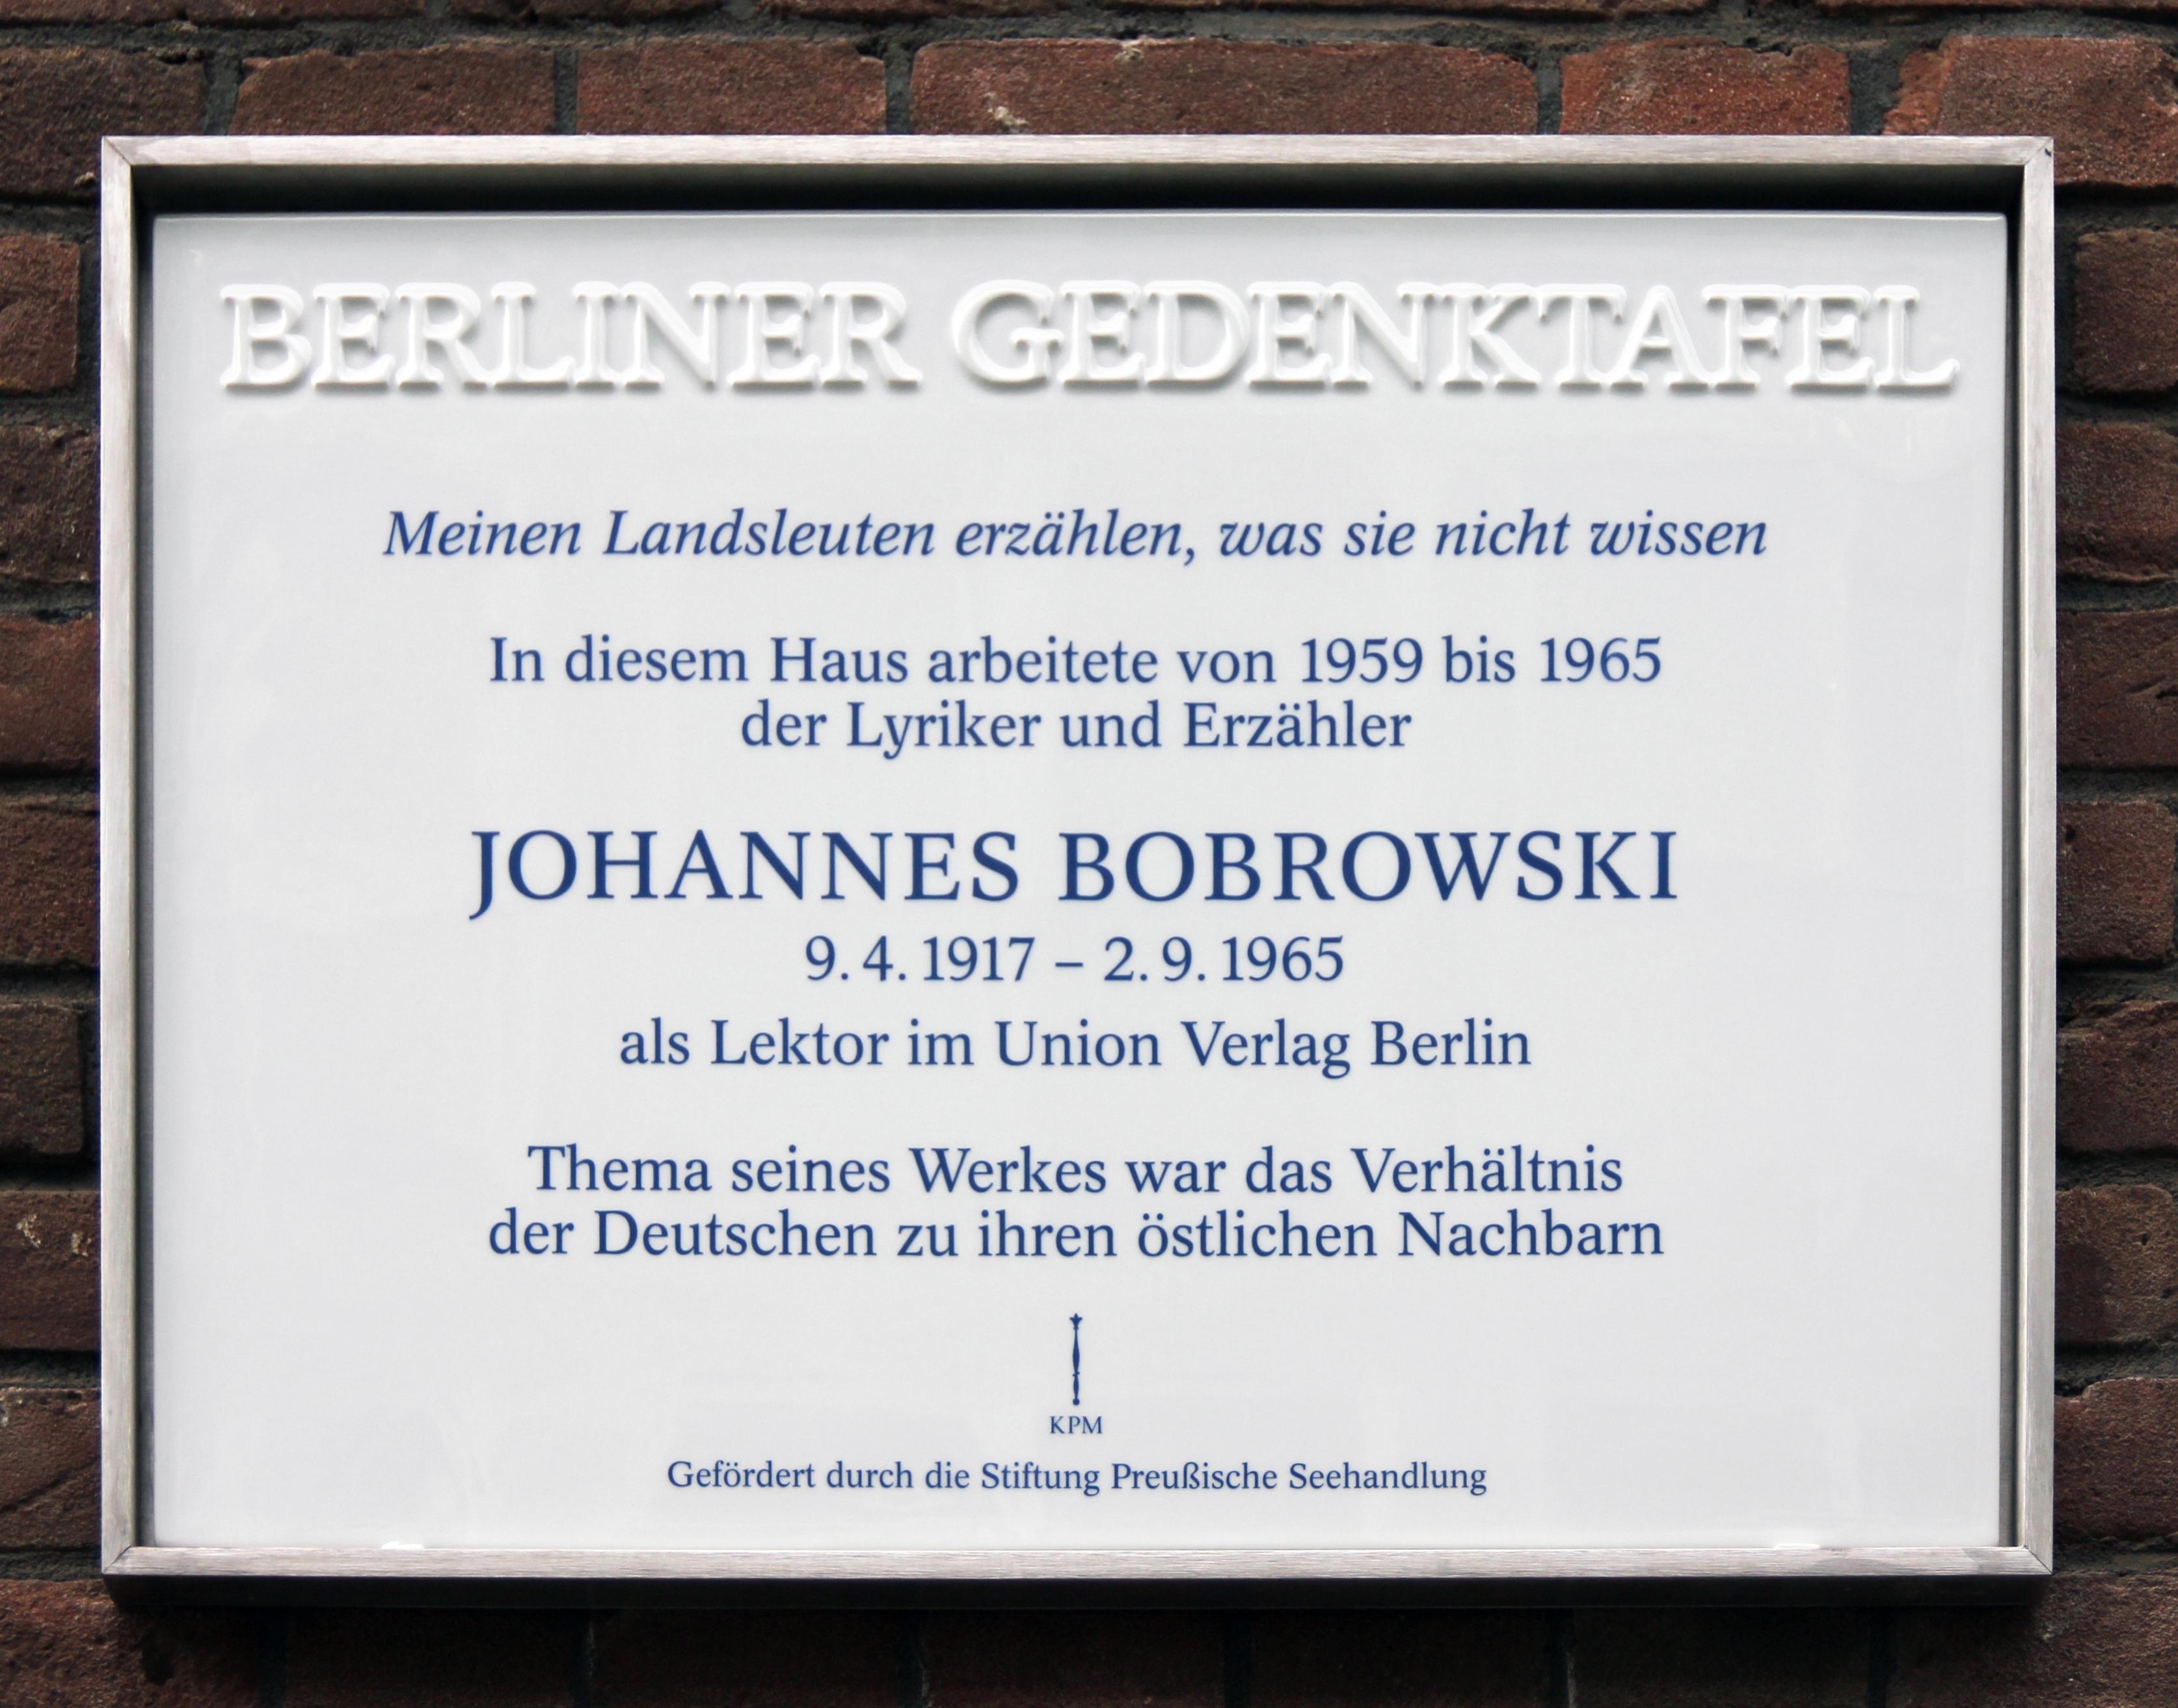 Johannes Bobrowski Wikipedia